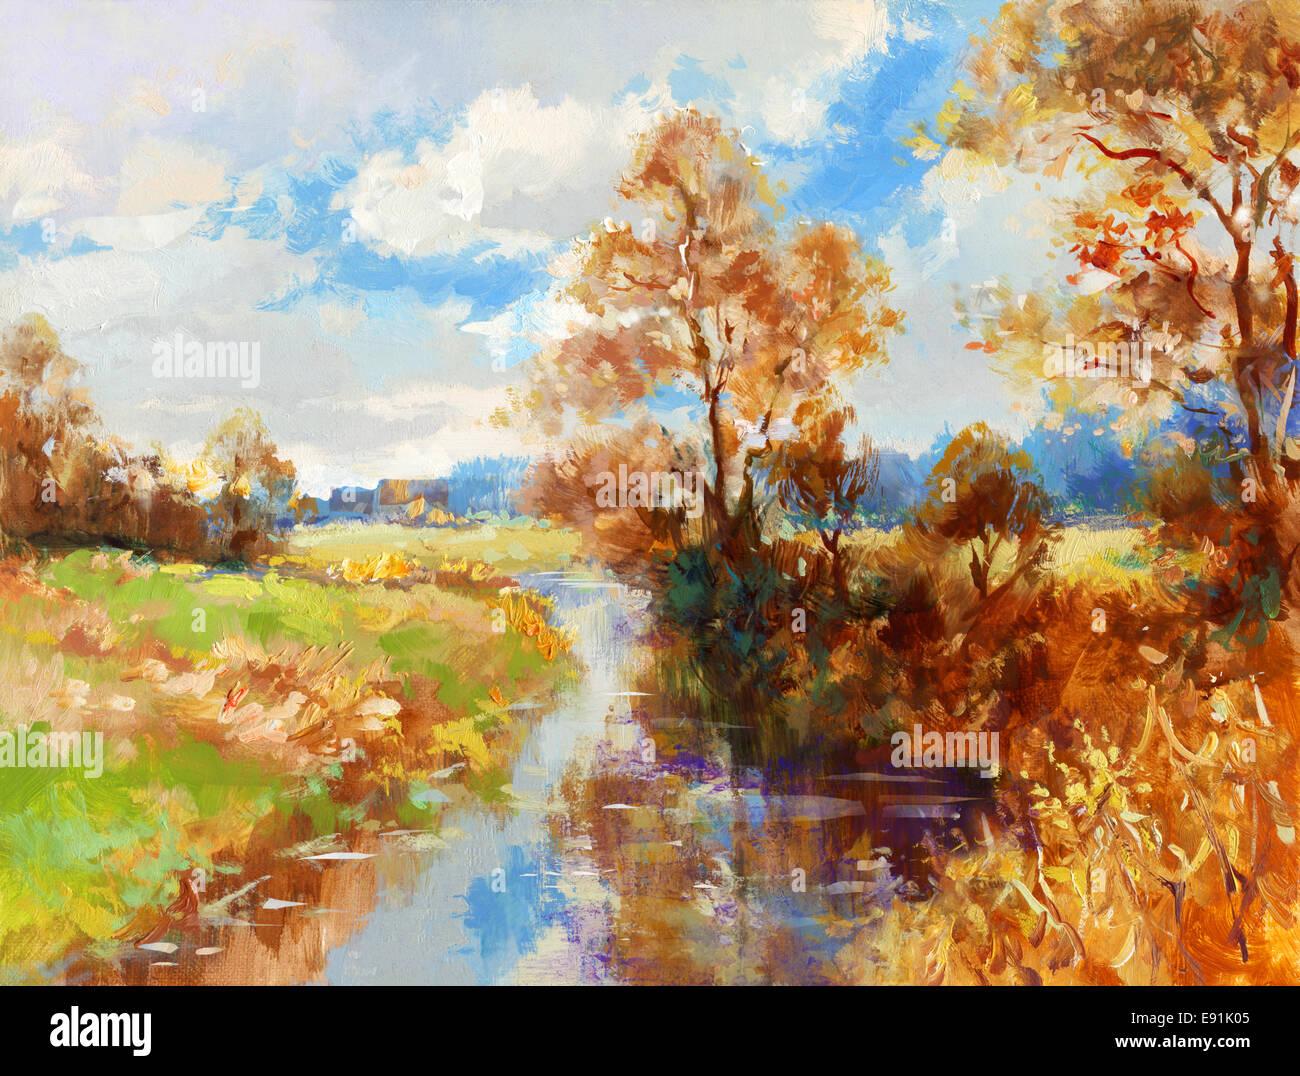 painted landscape - Stock Image